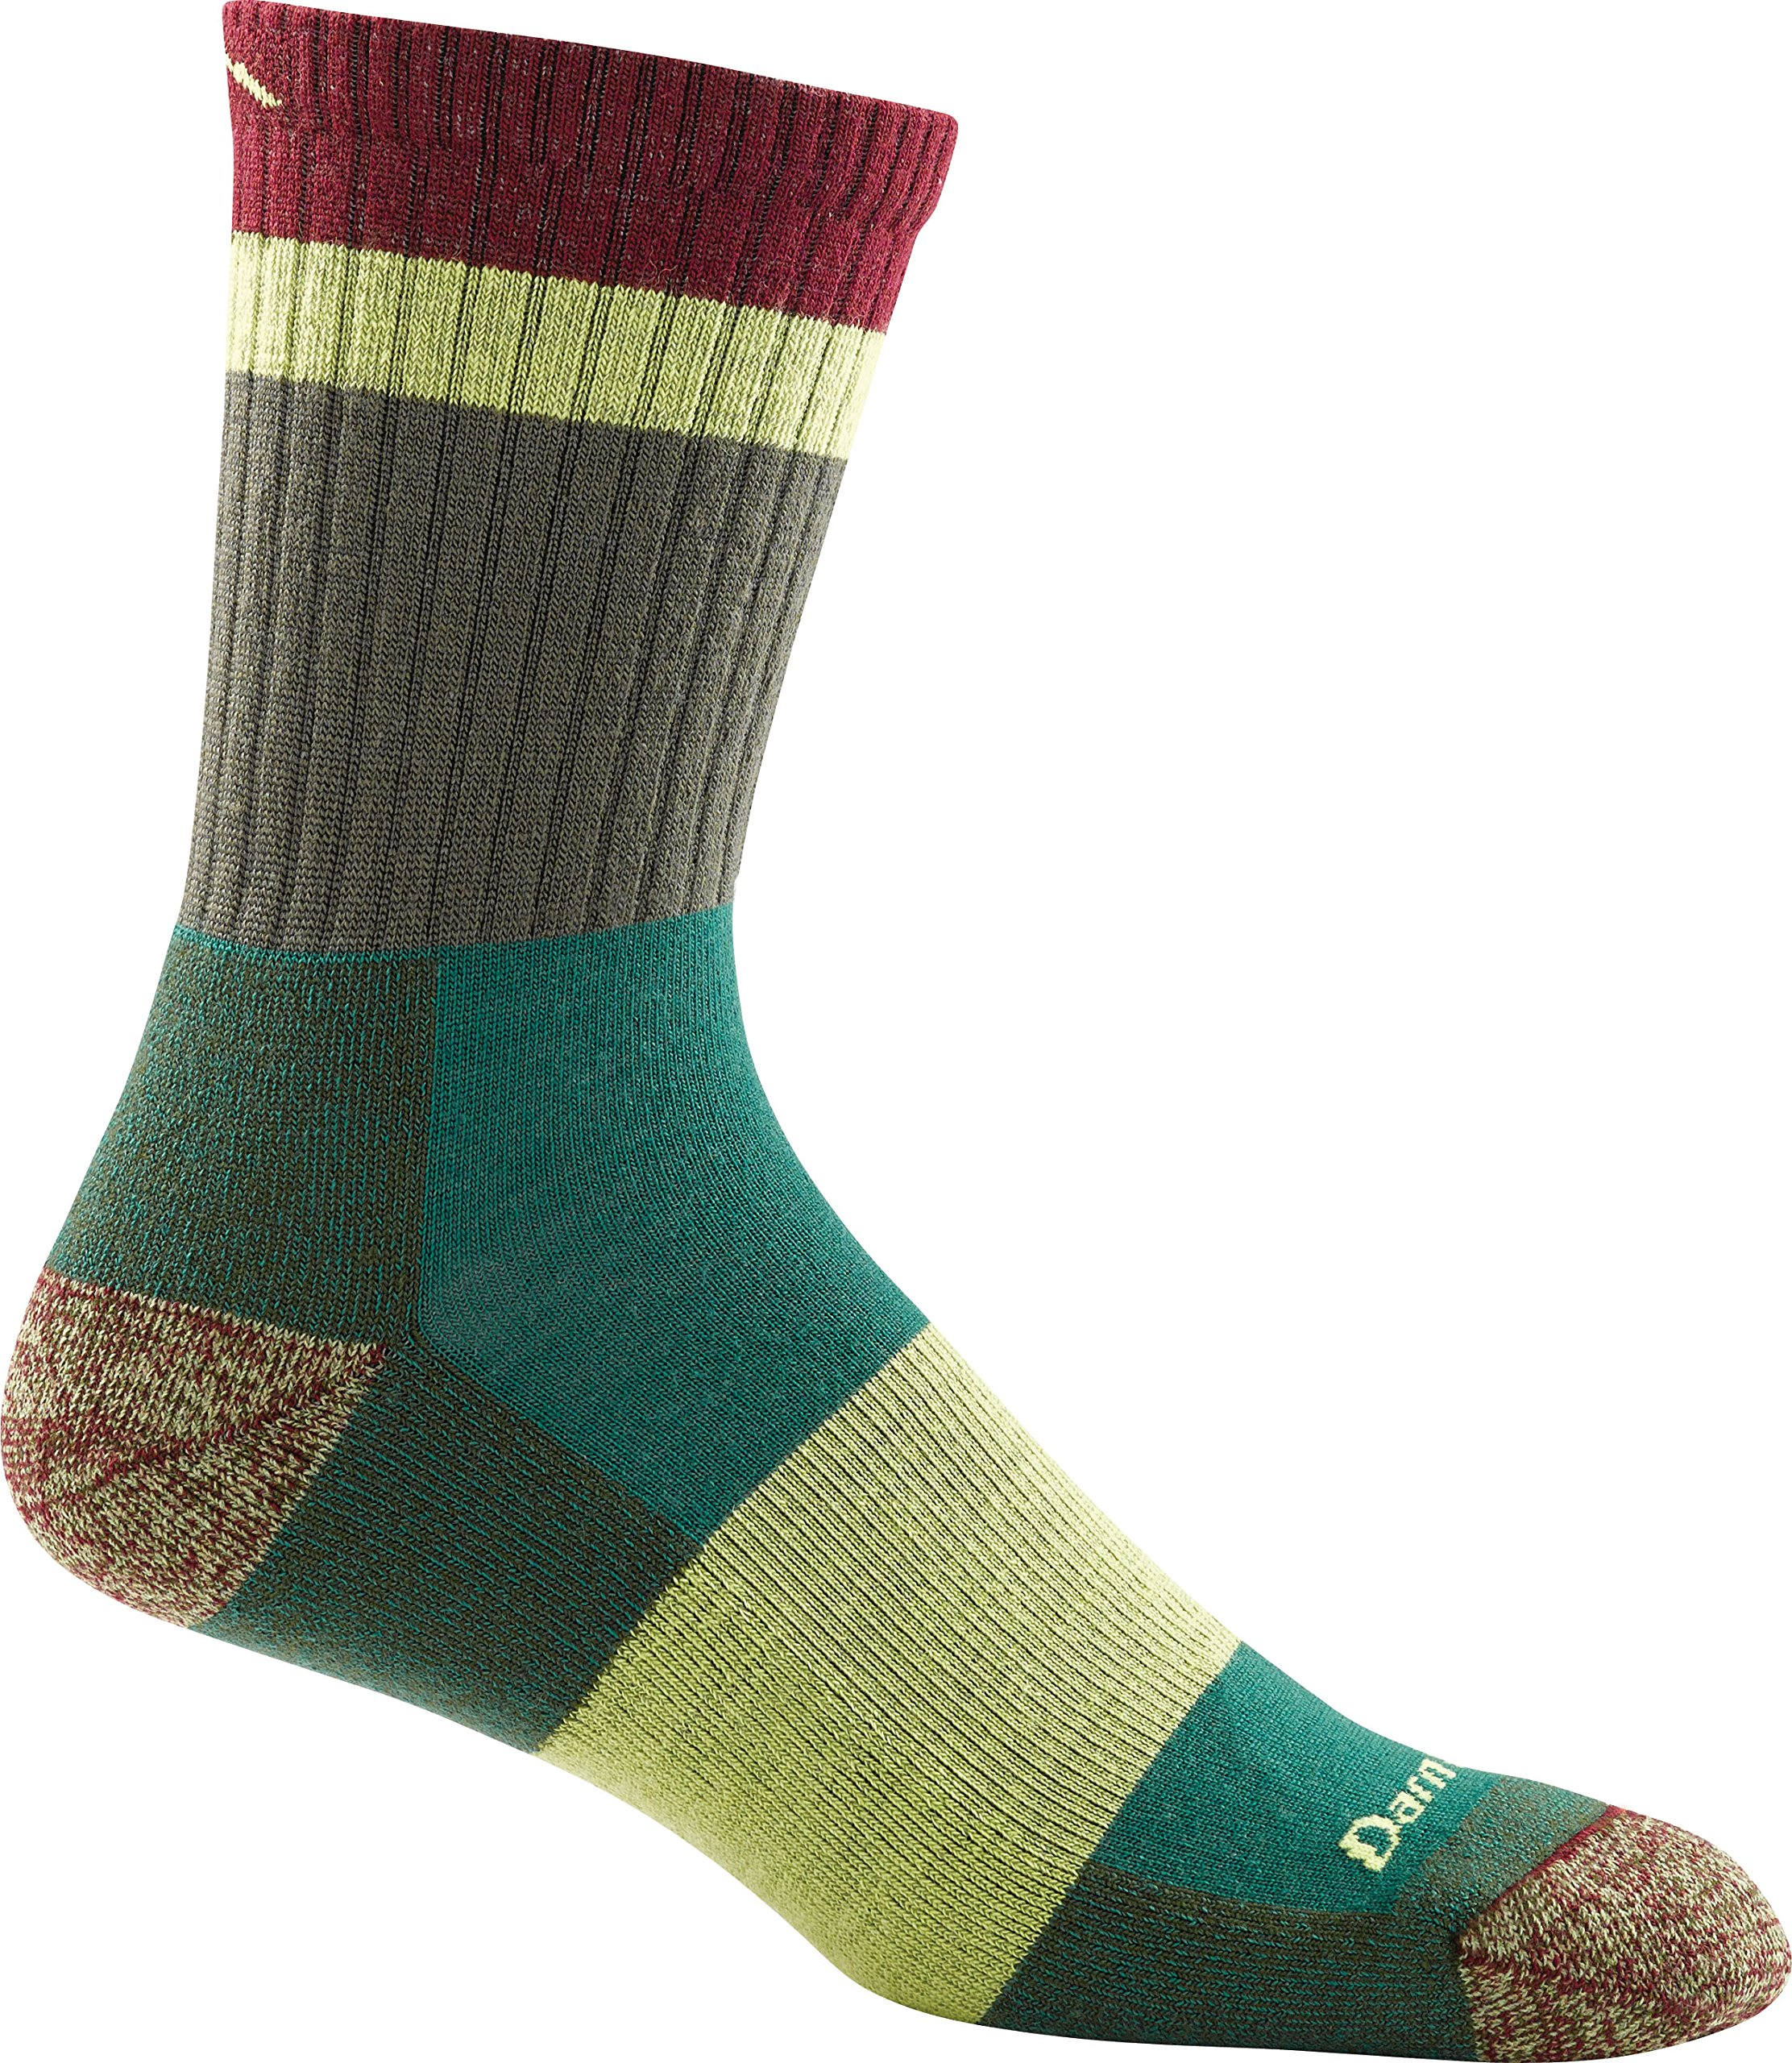 Darn Tough Heady Stripe Micro Crew Light Cushion Socks - Men's Green Large